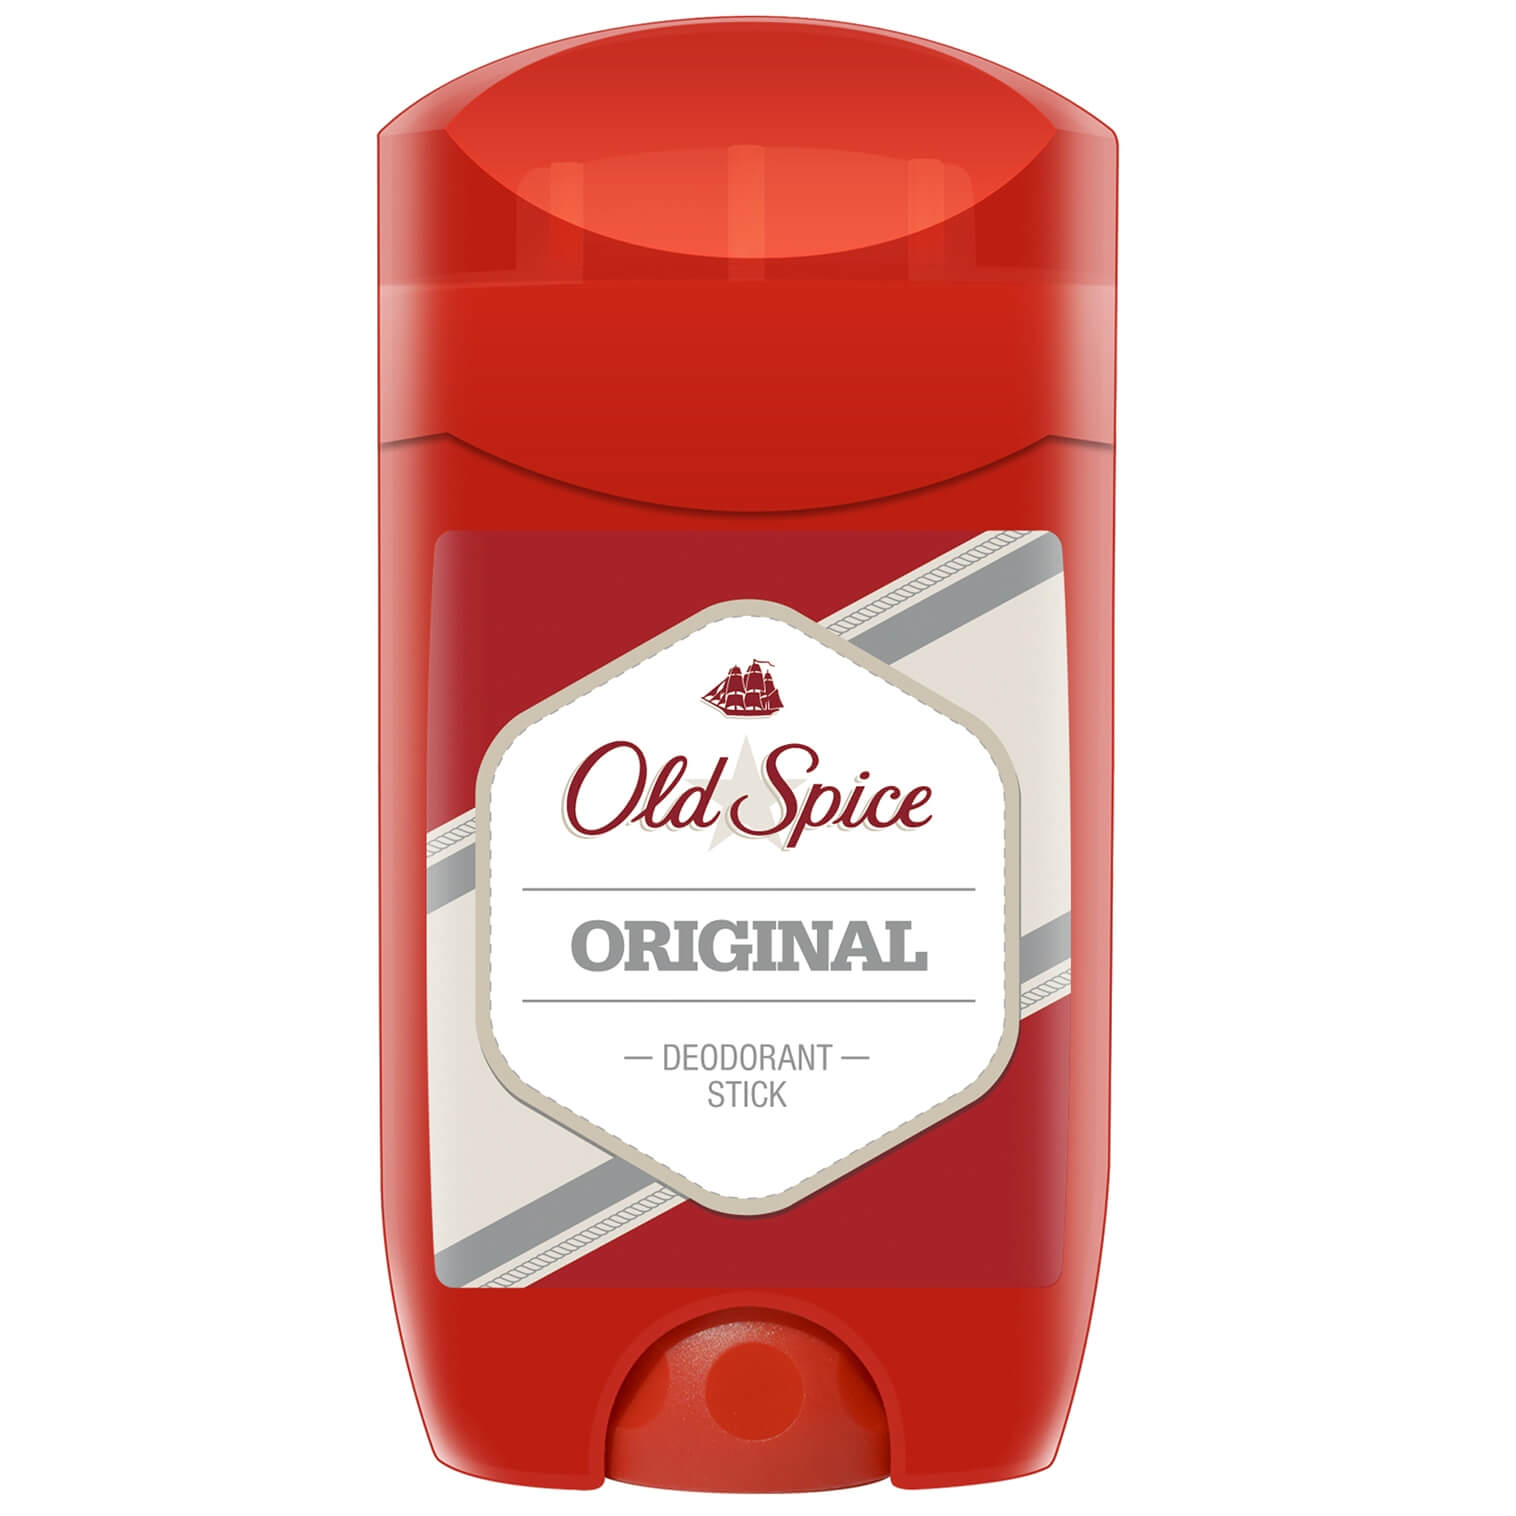 Old Spice Original Deodorant Stick Αποσμητικόμε Αναζωογονητικό και Αρρενωπό Άρωμα 50ml